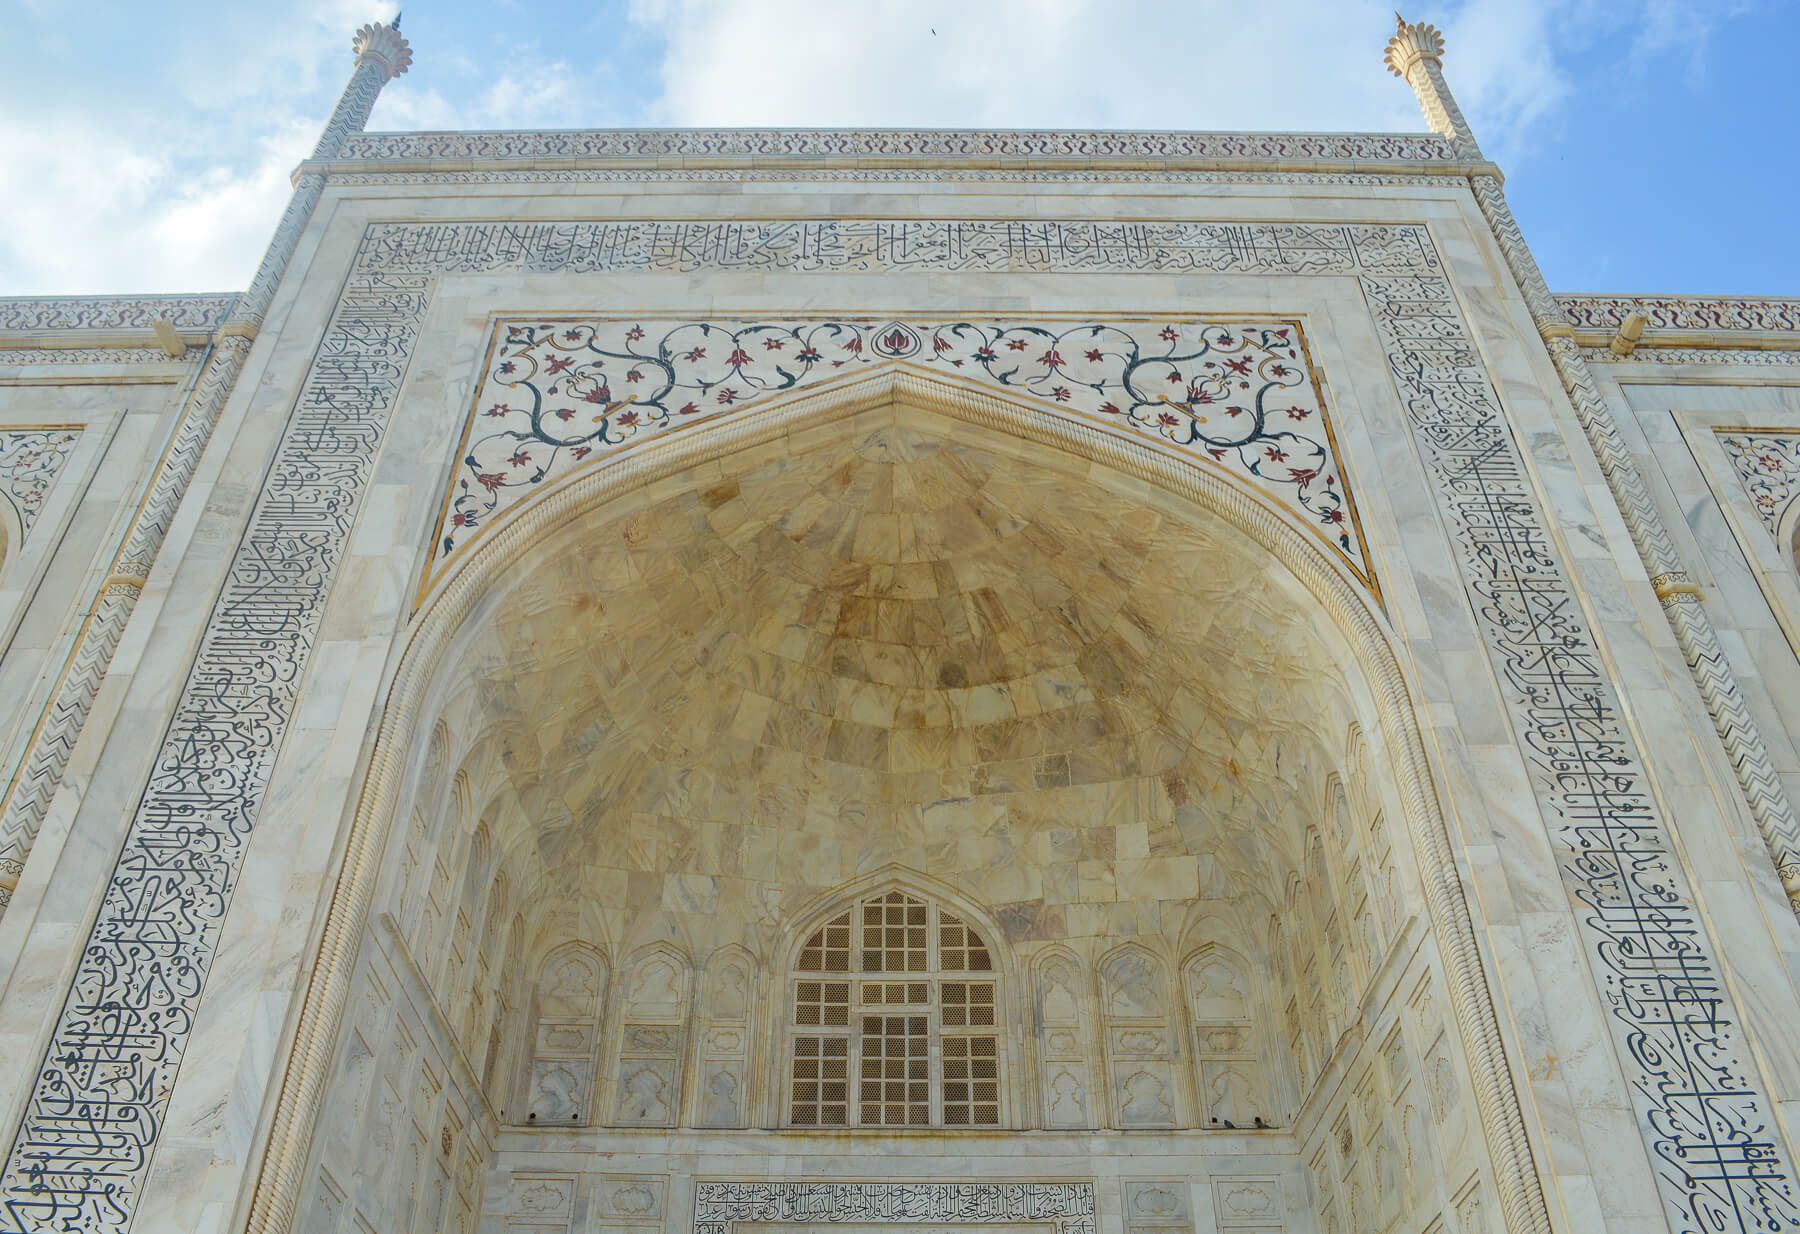 The marble entrance to the Taj Mahal